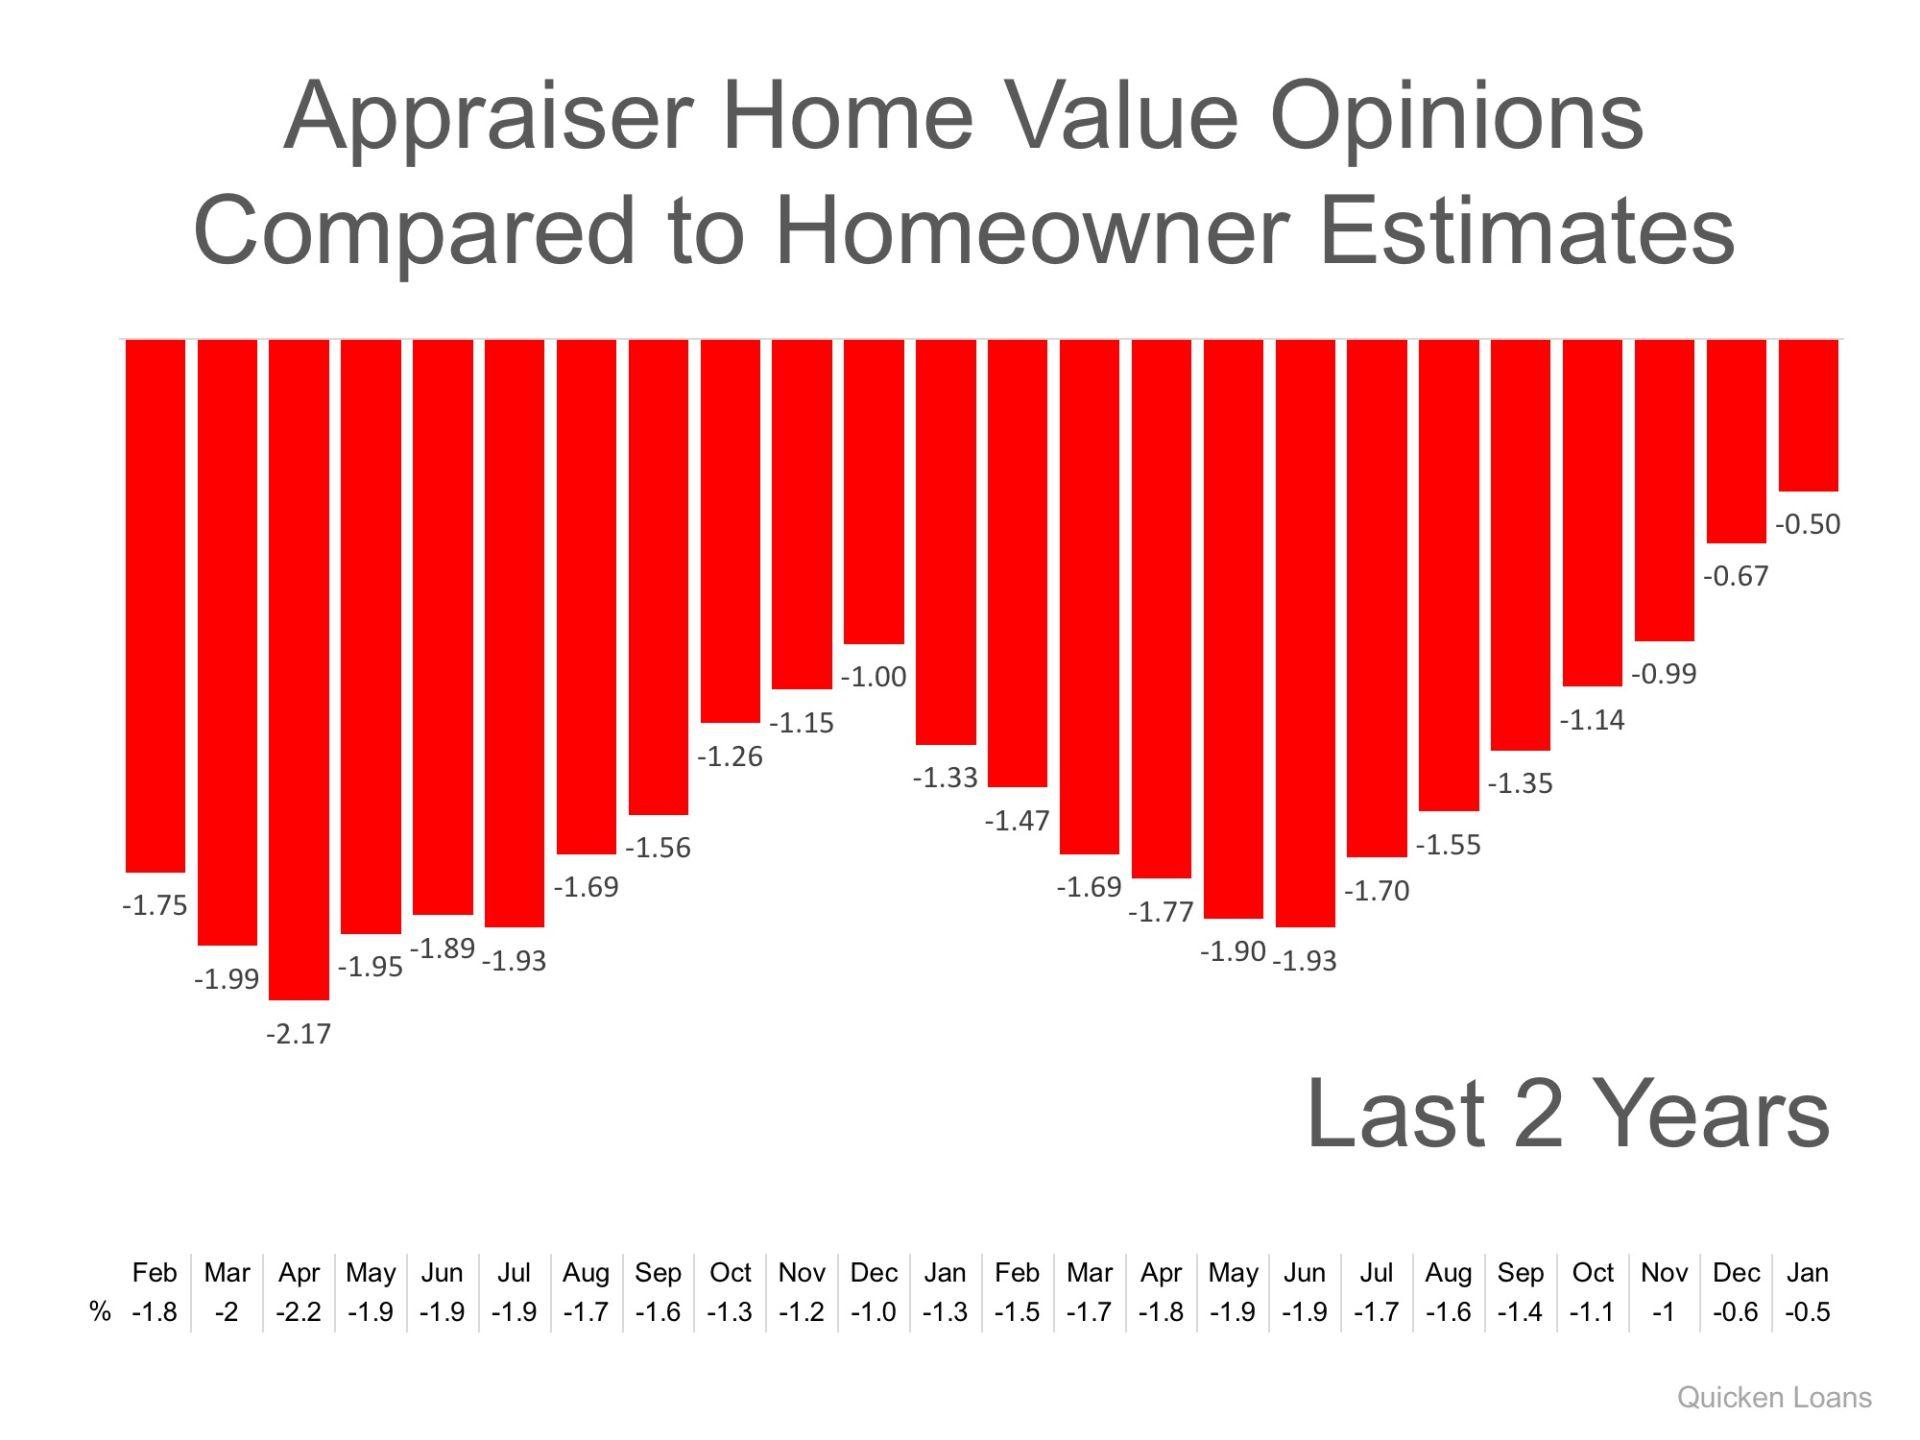 Gap Between Homeowners & Appraisers Narrows to Lowest Mark in 2 Years